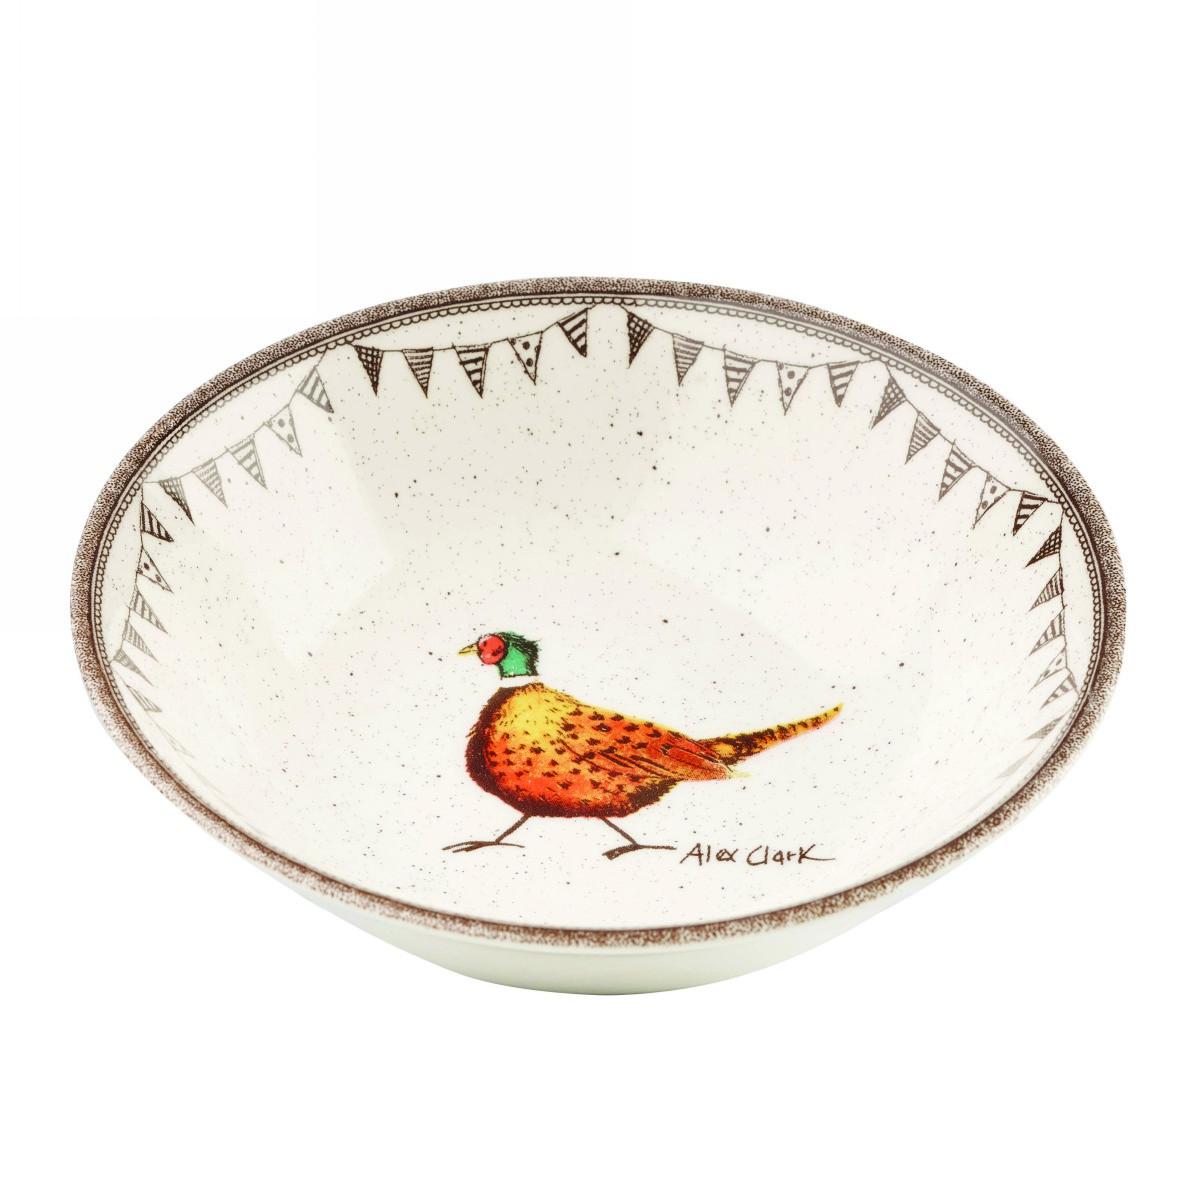 Тарелка для каши Churchill 15 см Живая природа Алекс Кларк